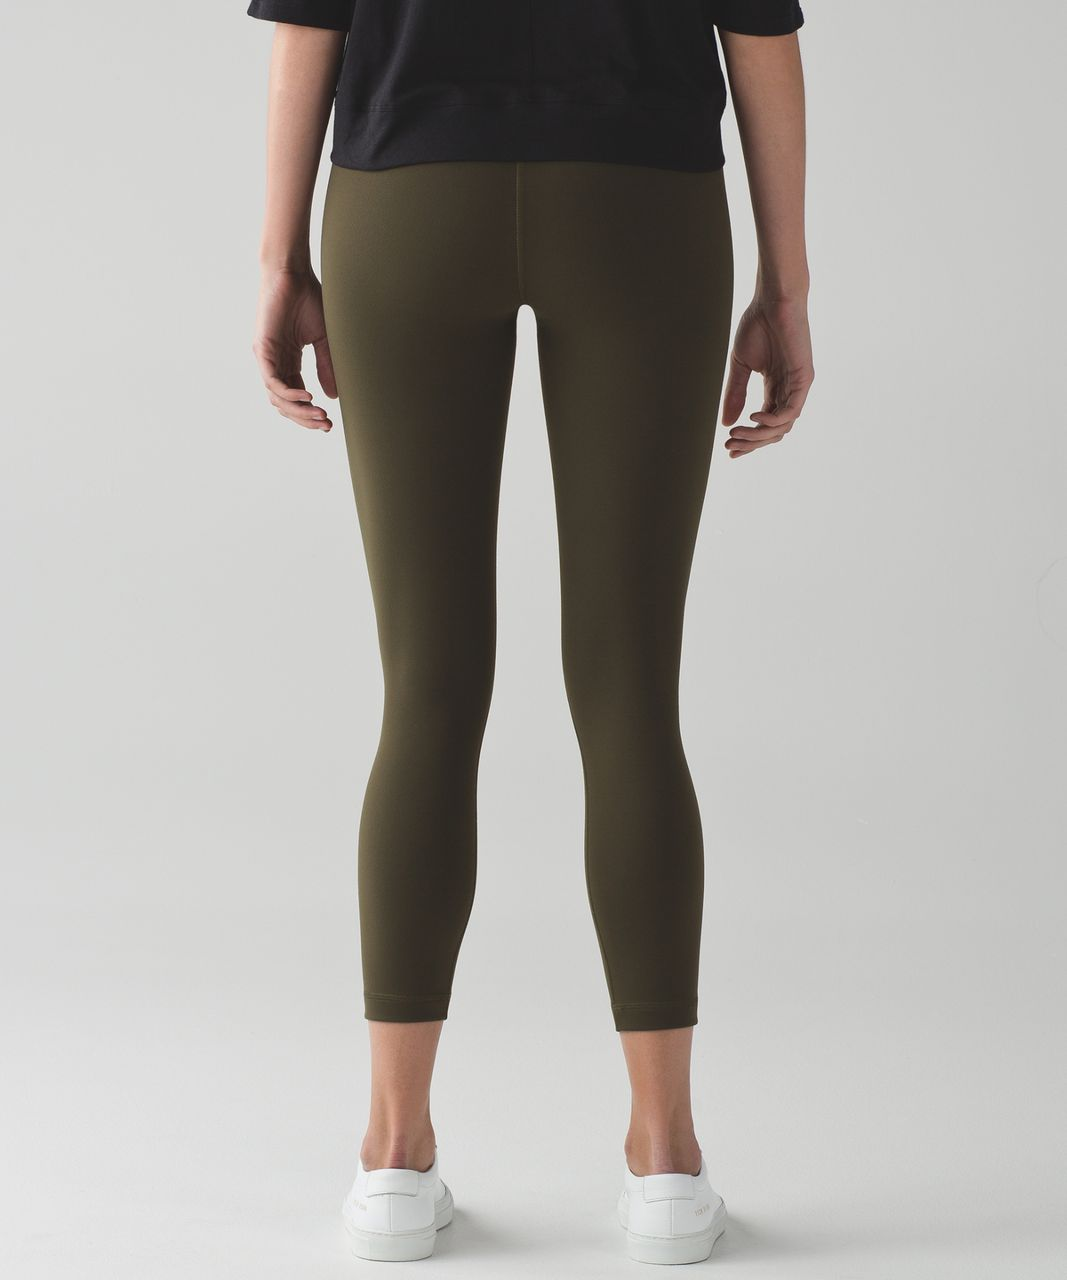 Lululemon High Times Pant (Full-On Luon) - Military Green